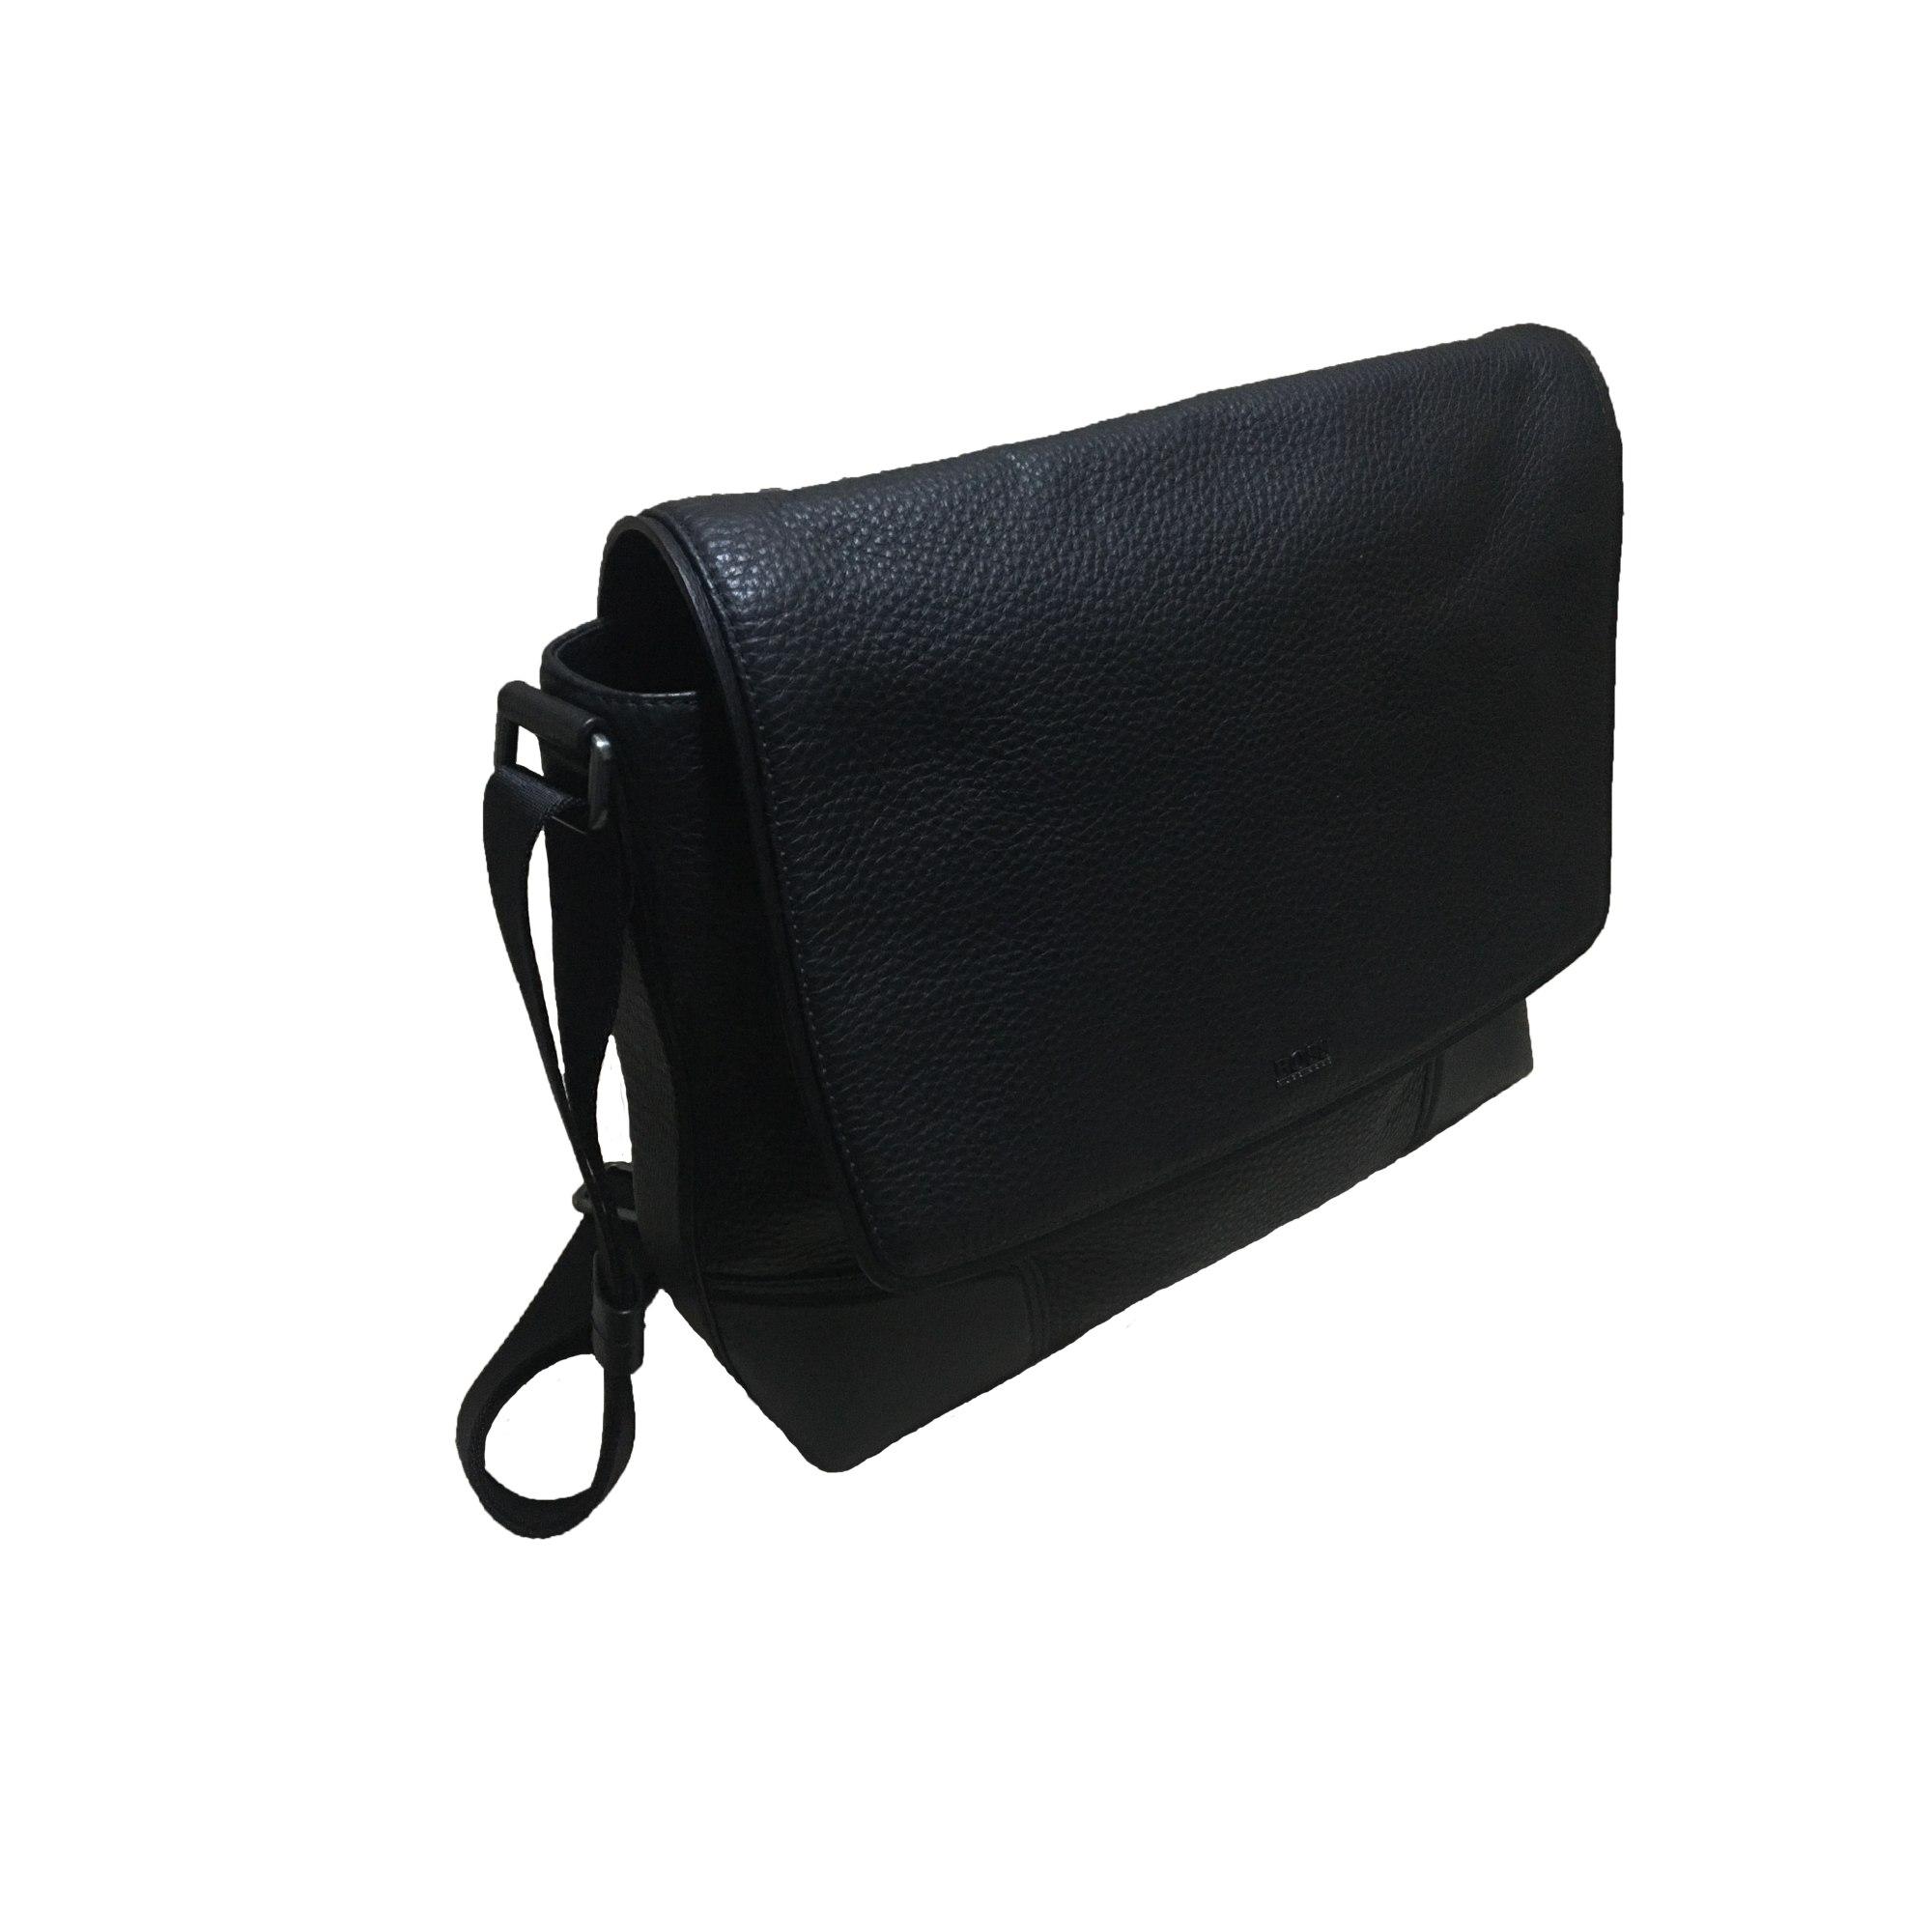 Sacoche HUGO BOSS noir vendu par Leather sense - 6038762 d8a5ed19071